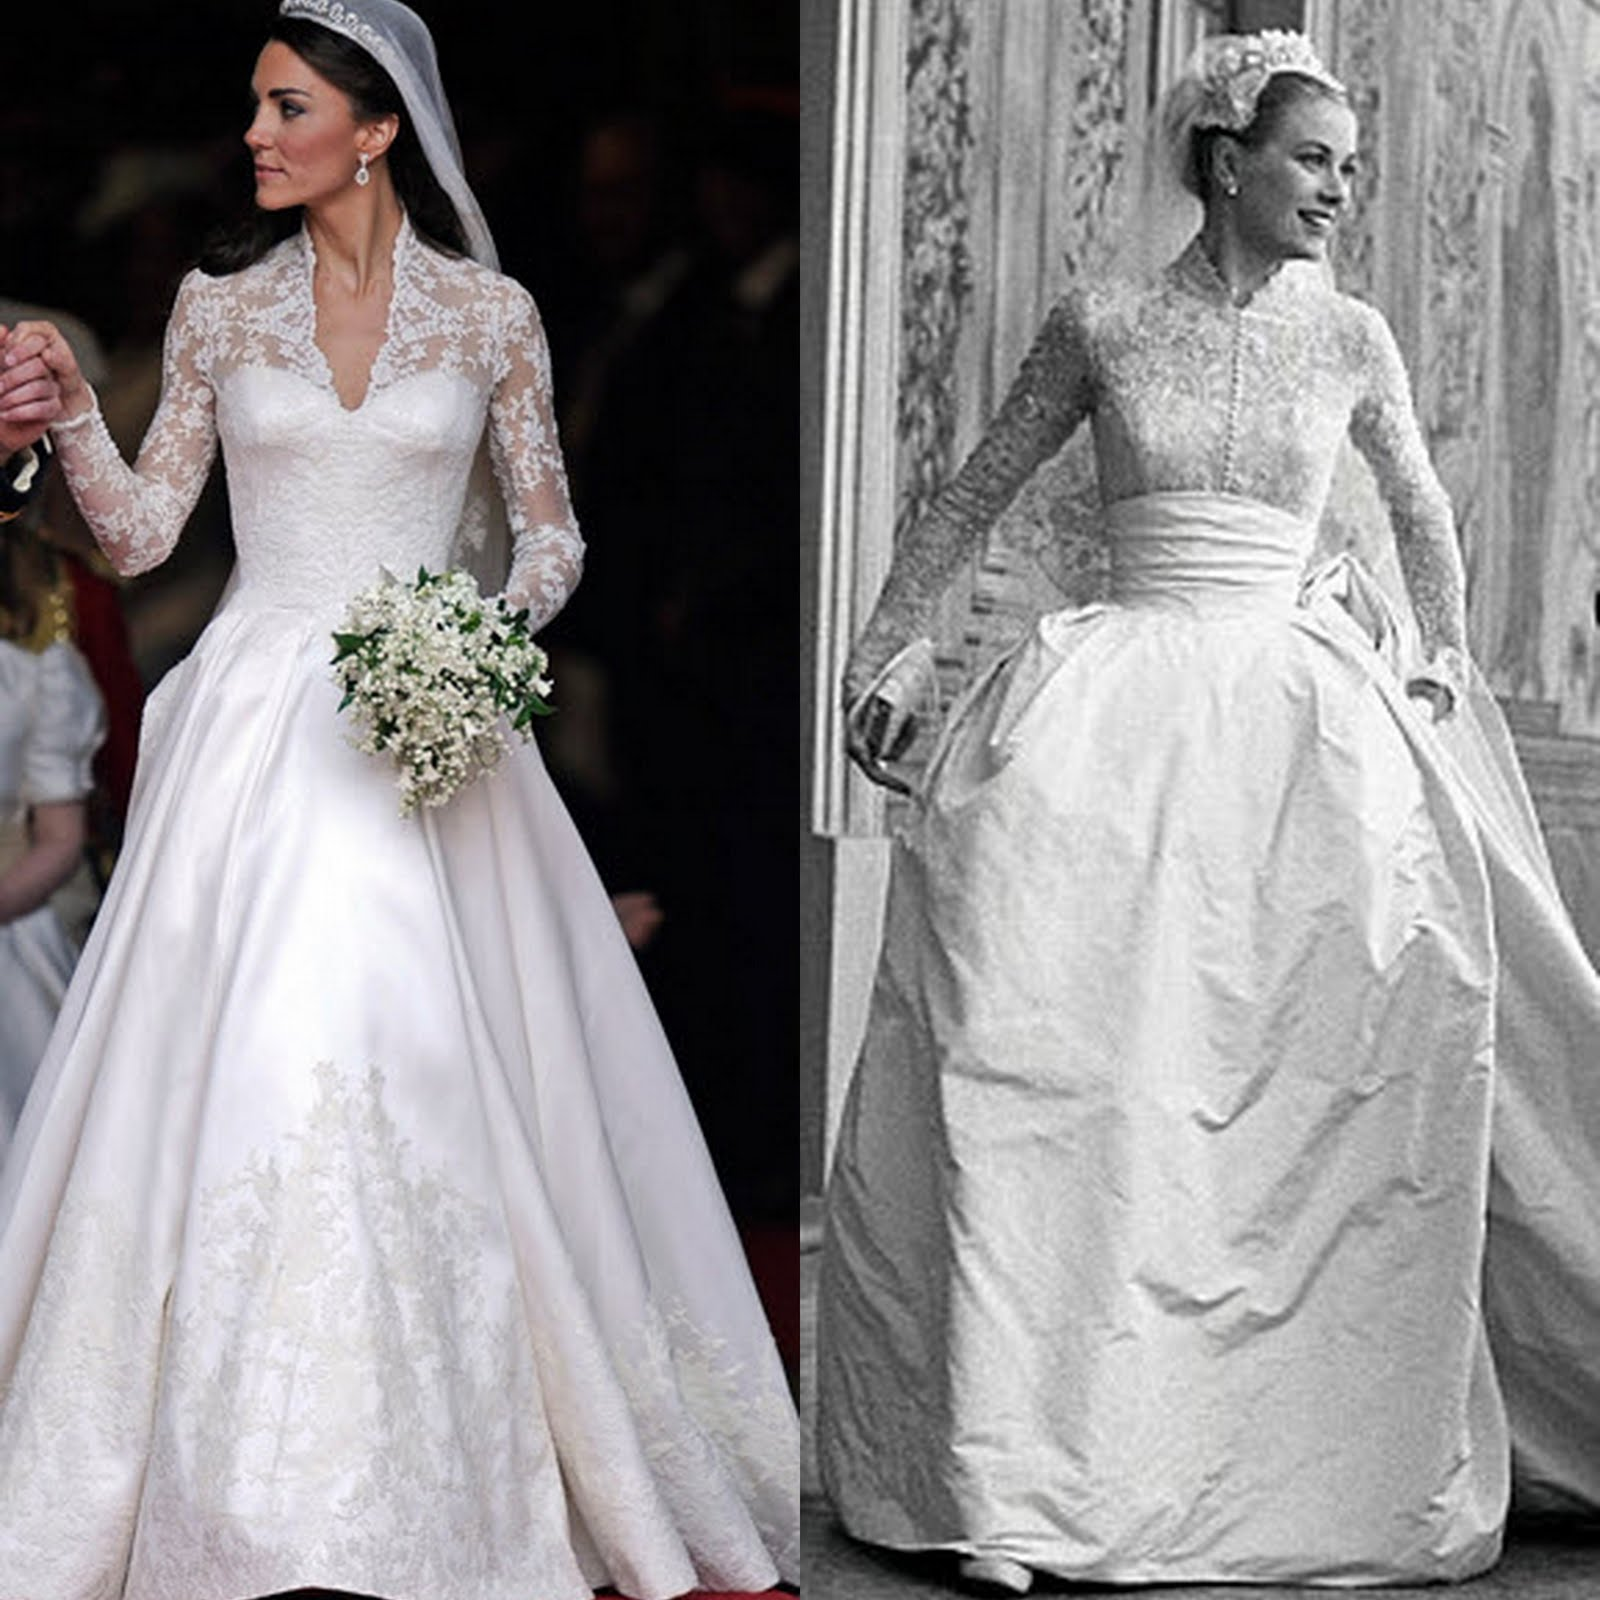 Winter wedding dress ideas she 39 said 39 for Princess grace wedding dress